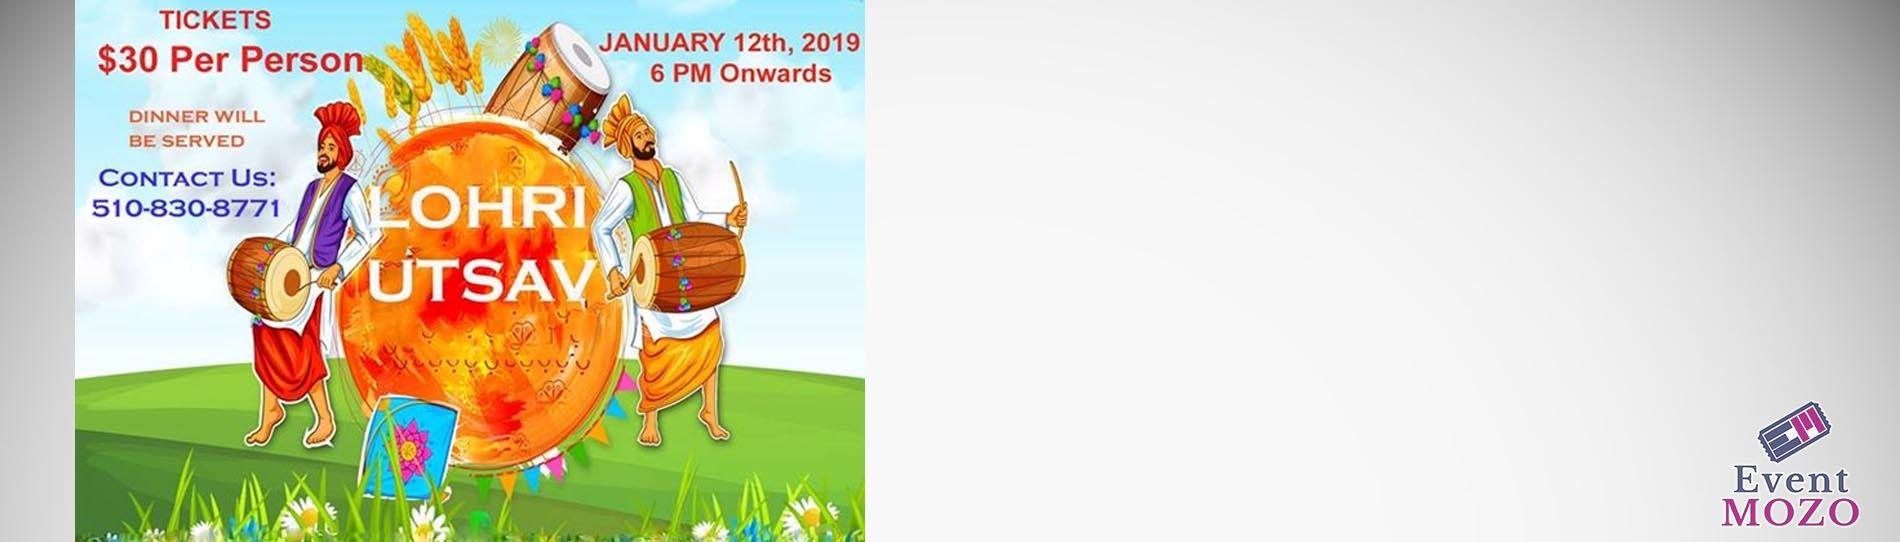 EventMozo Lohri Utsav - 2019